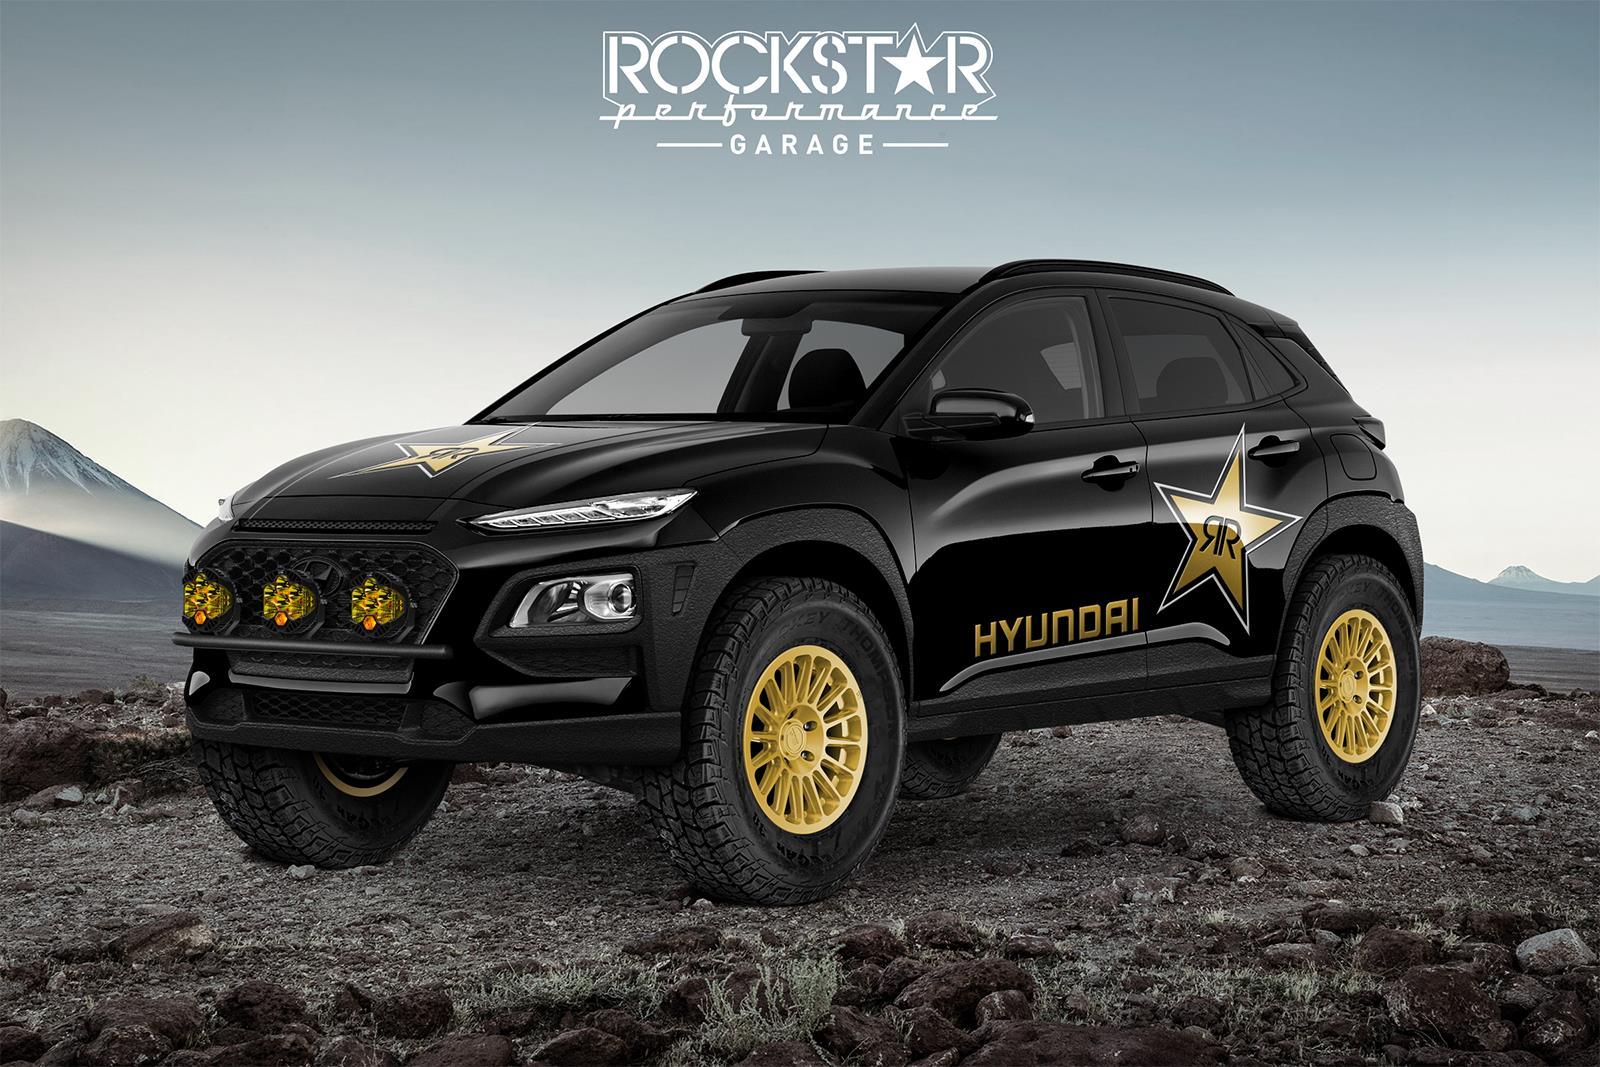 Hyundai Teases Rockstar Kona Ultimate Concept for SEMA